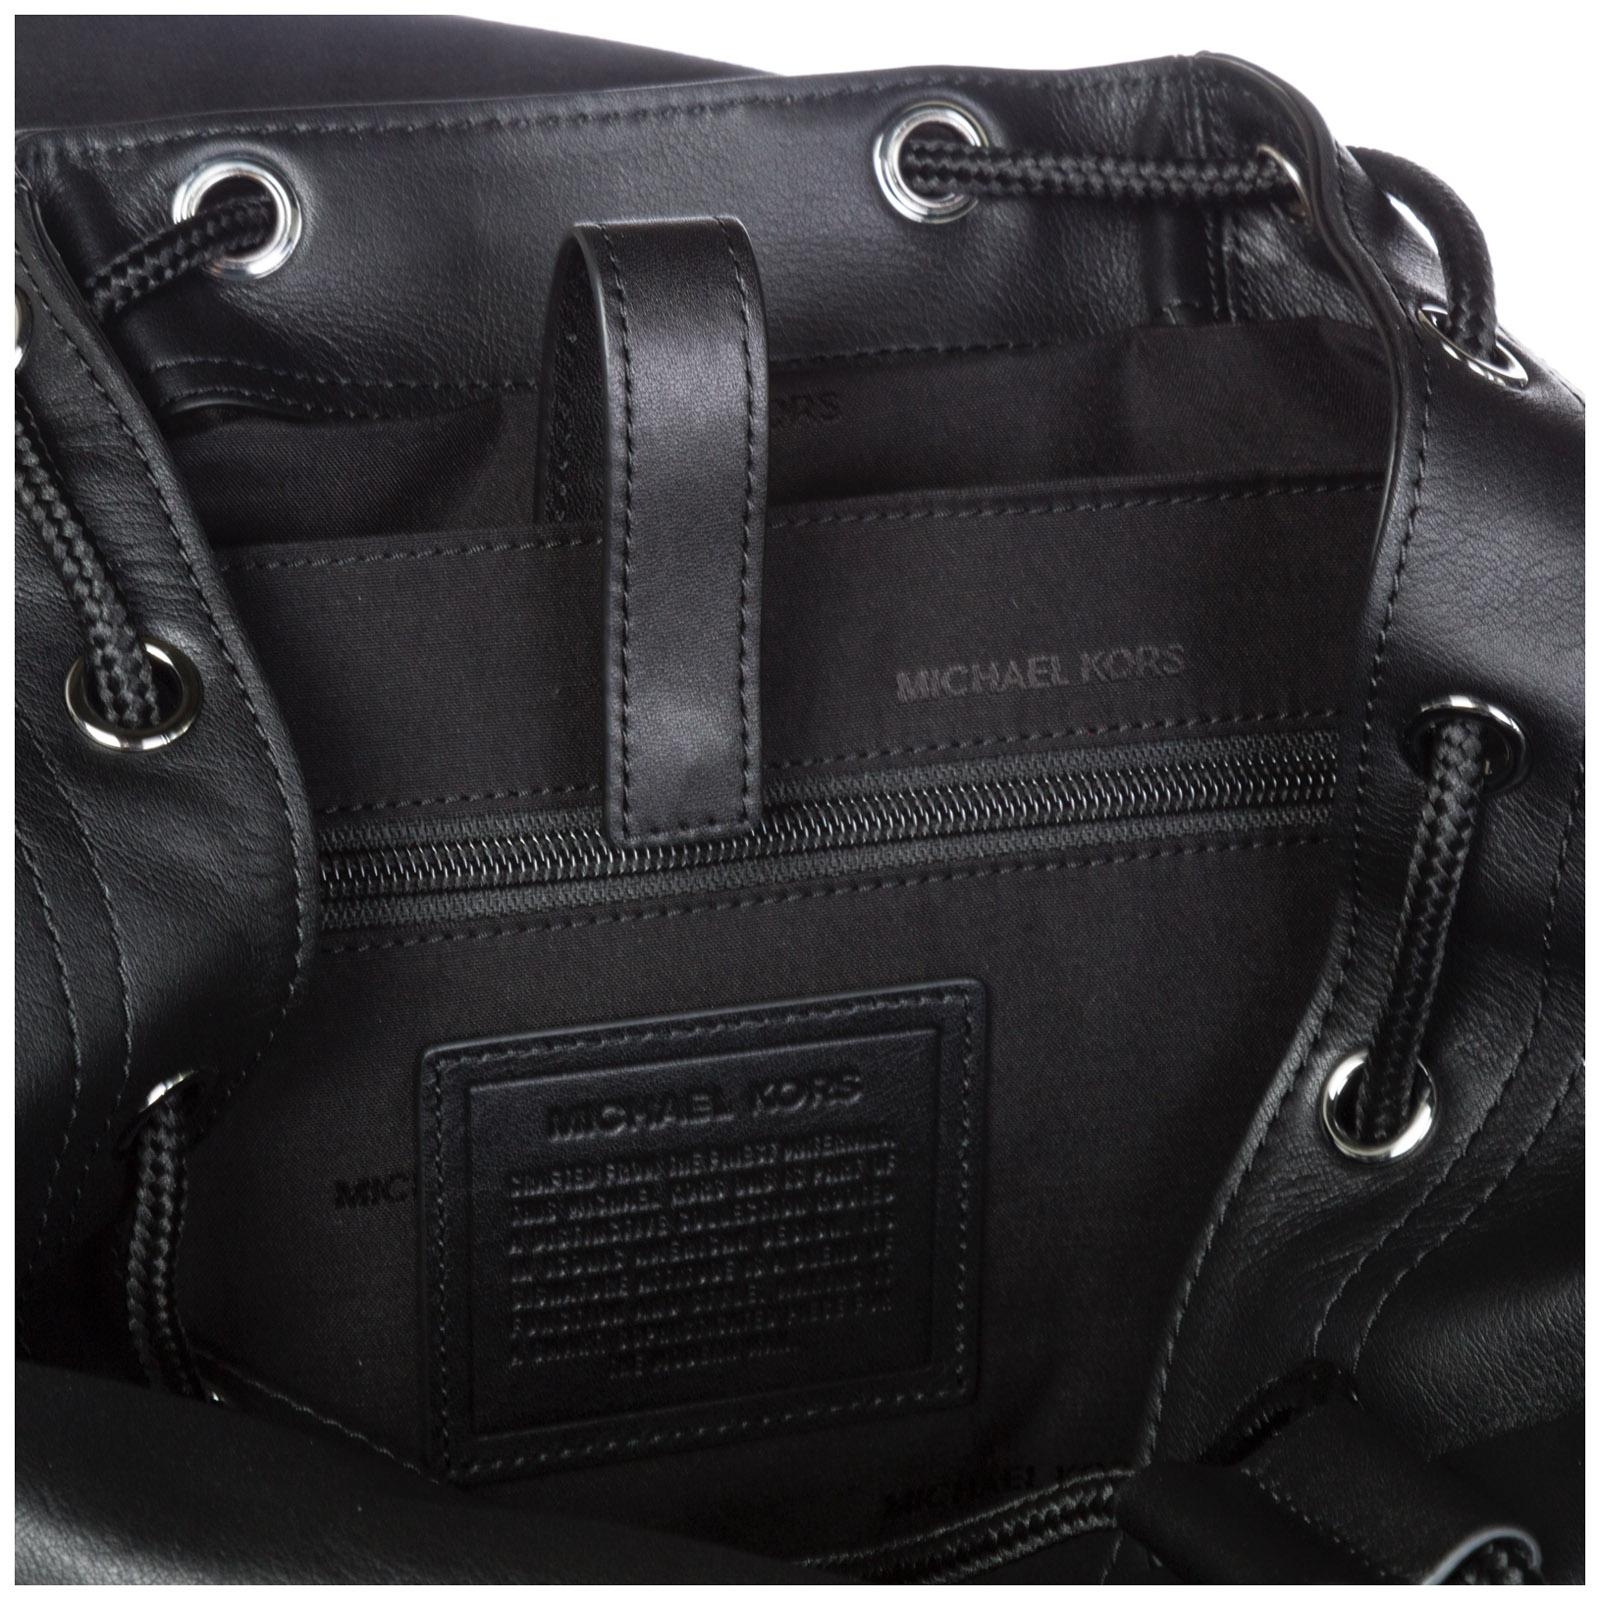 dbbe5affba Zaino Michael Kors Henry 33F8LHYB2L 001 black | FRMODA.com